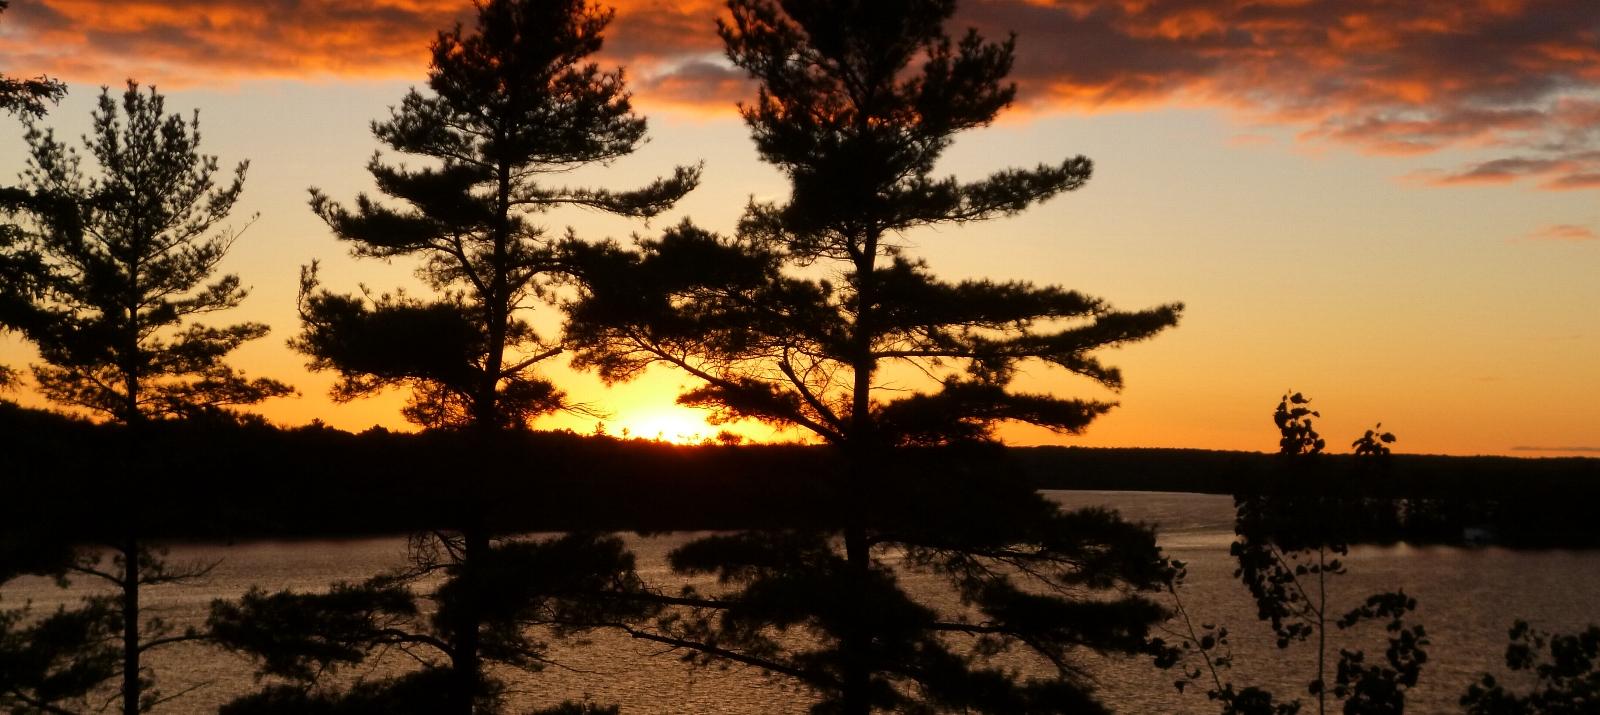 WEBIMAGES: 1600_x_715_sunset_lake.jpg